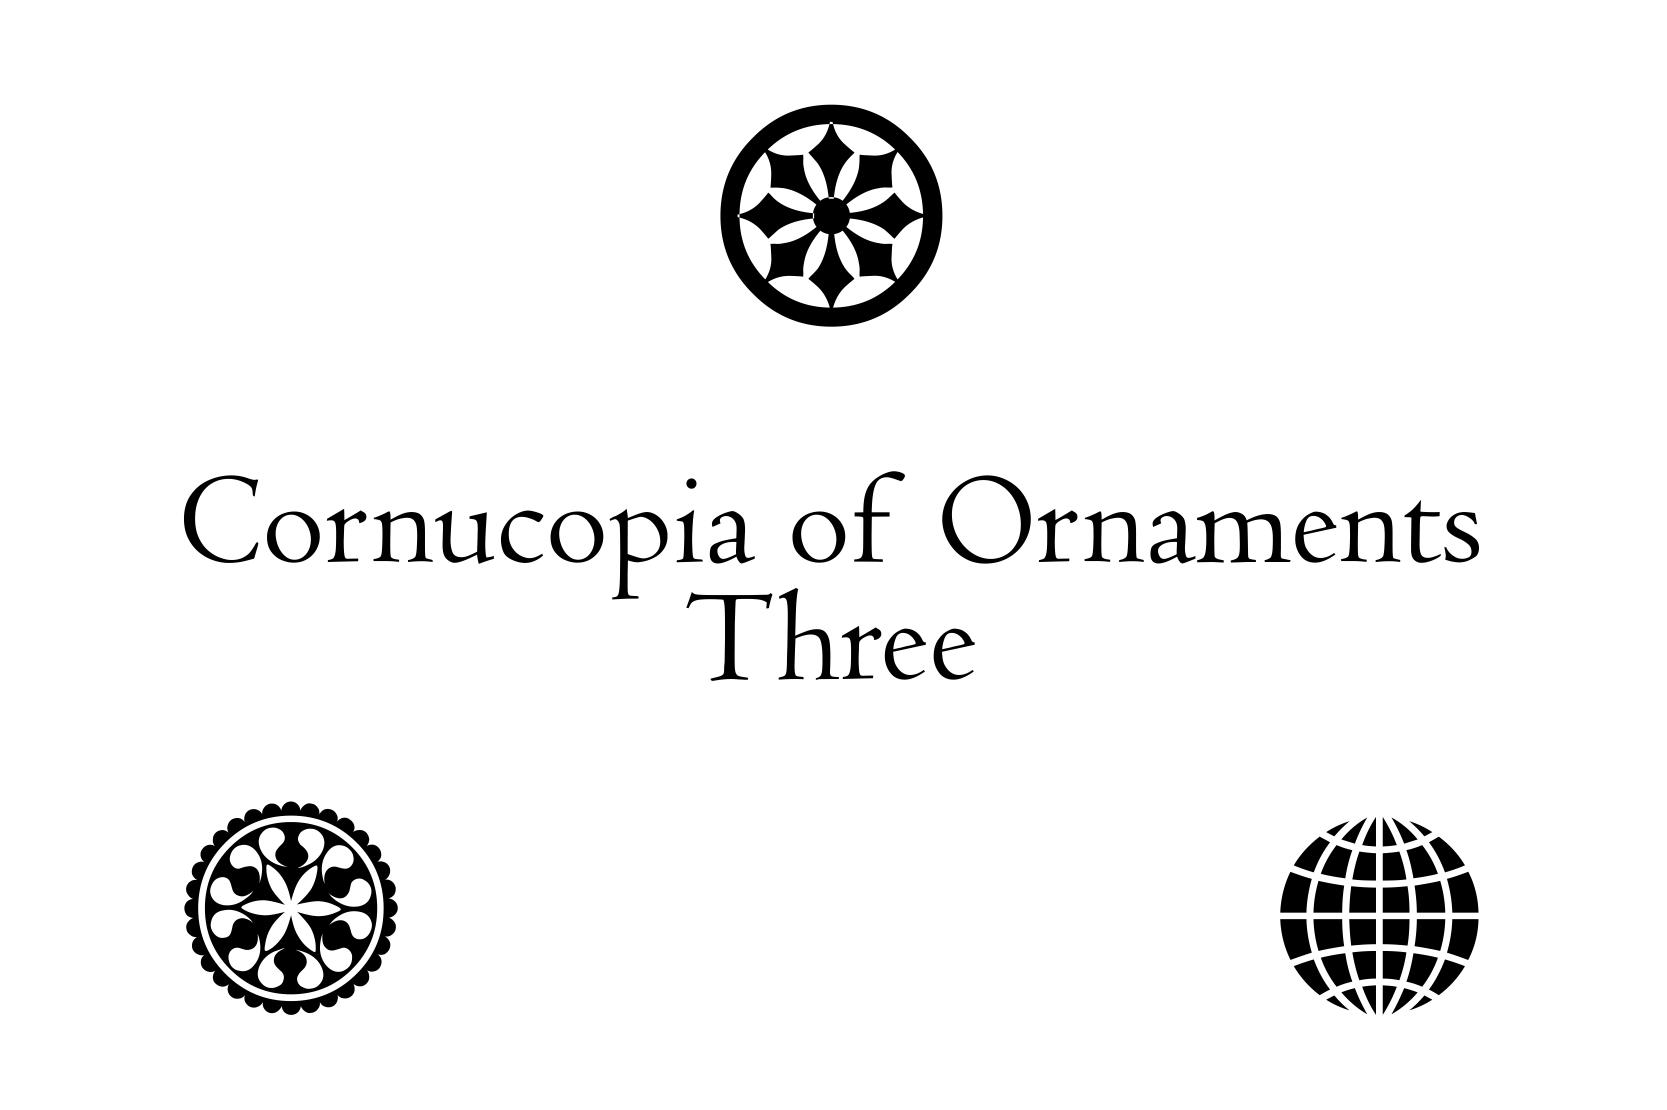 Cornucopia of Ornaments Three example image 3